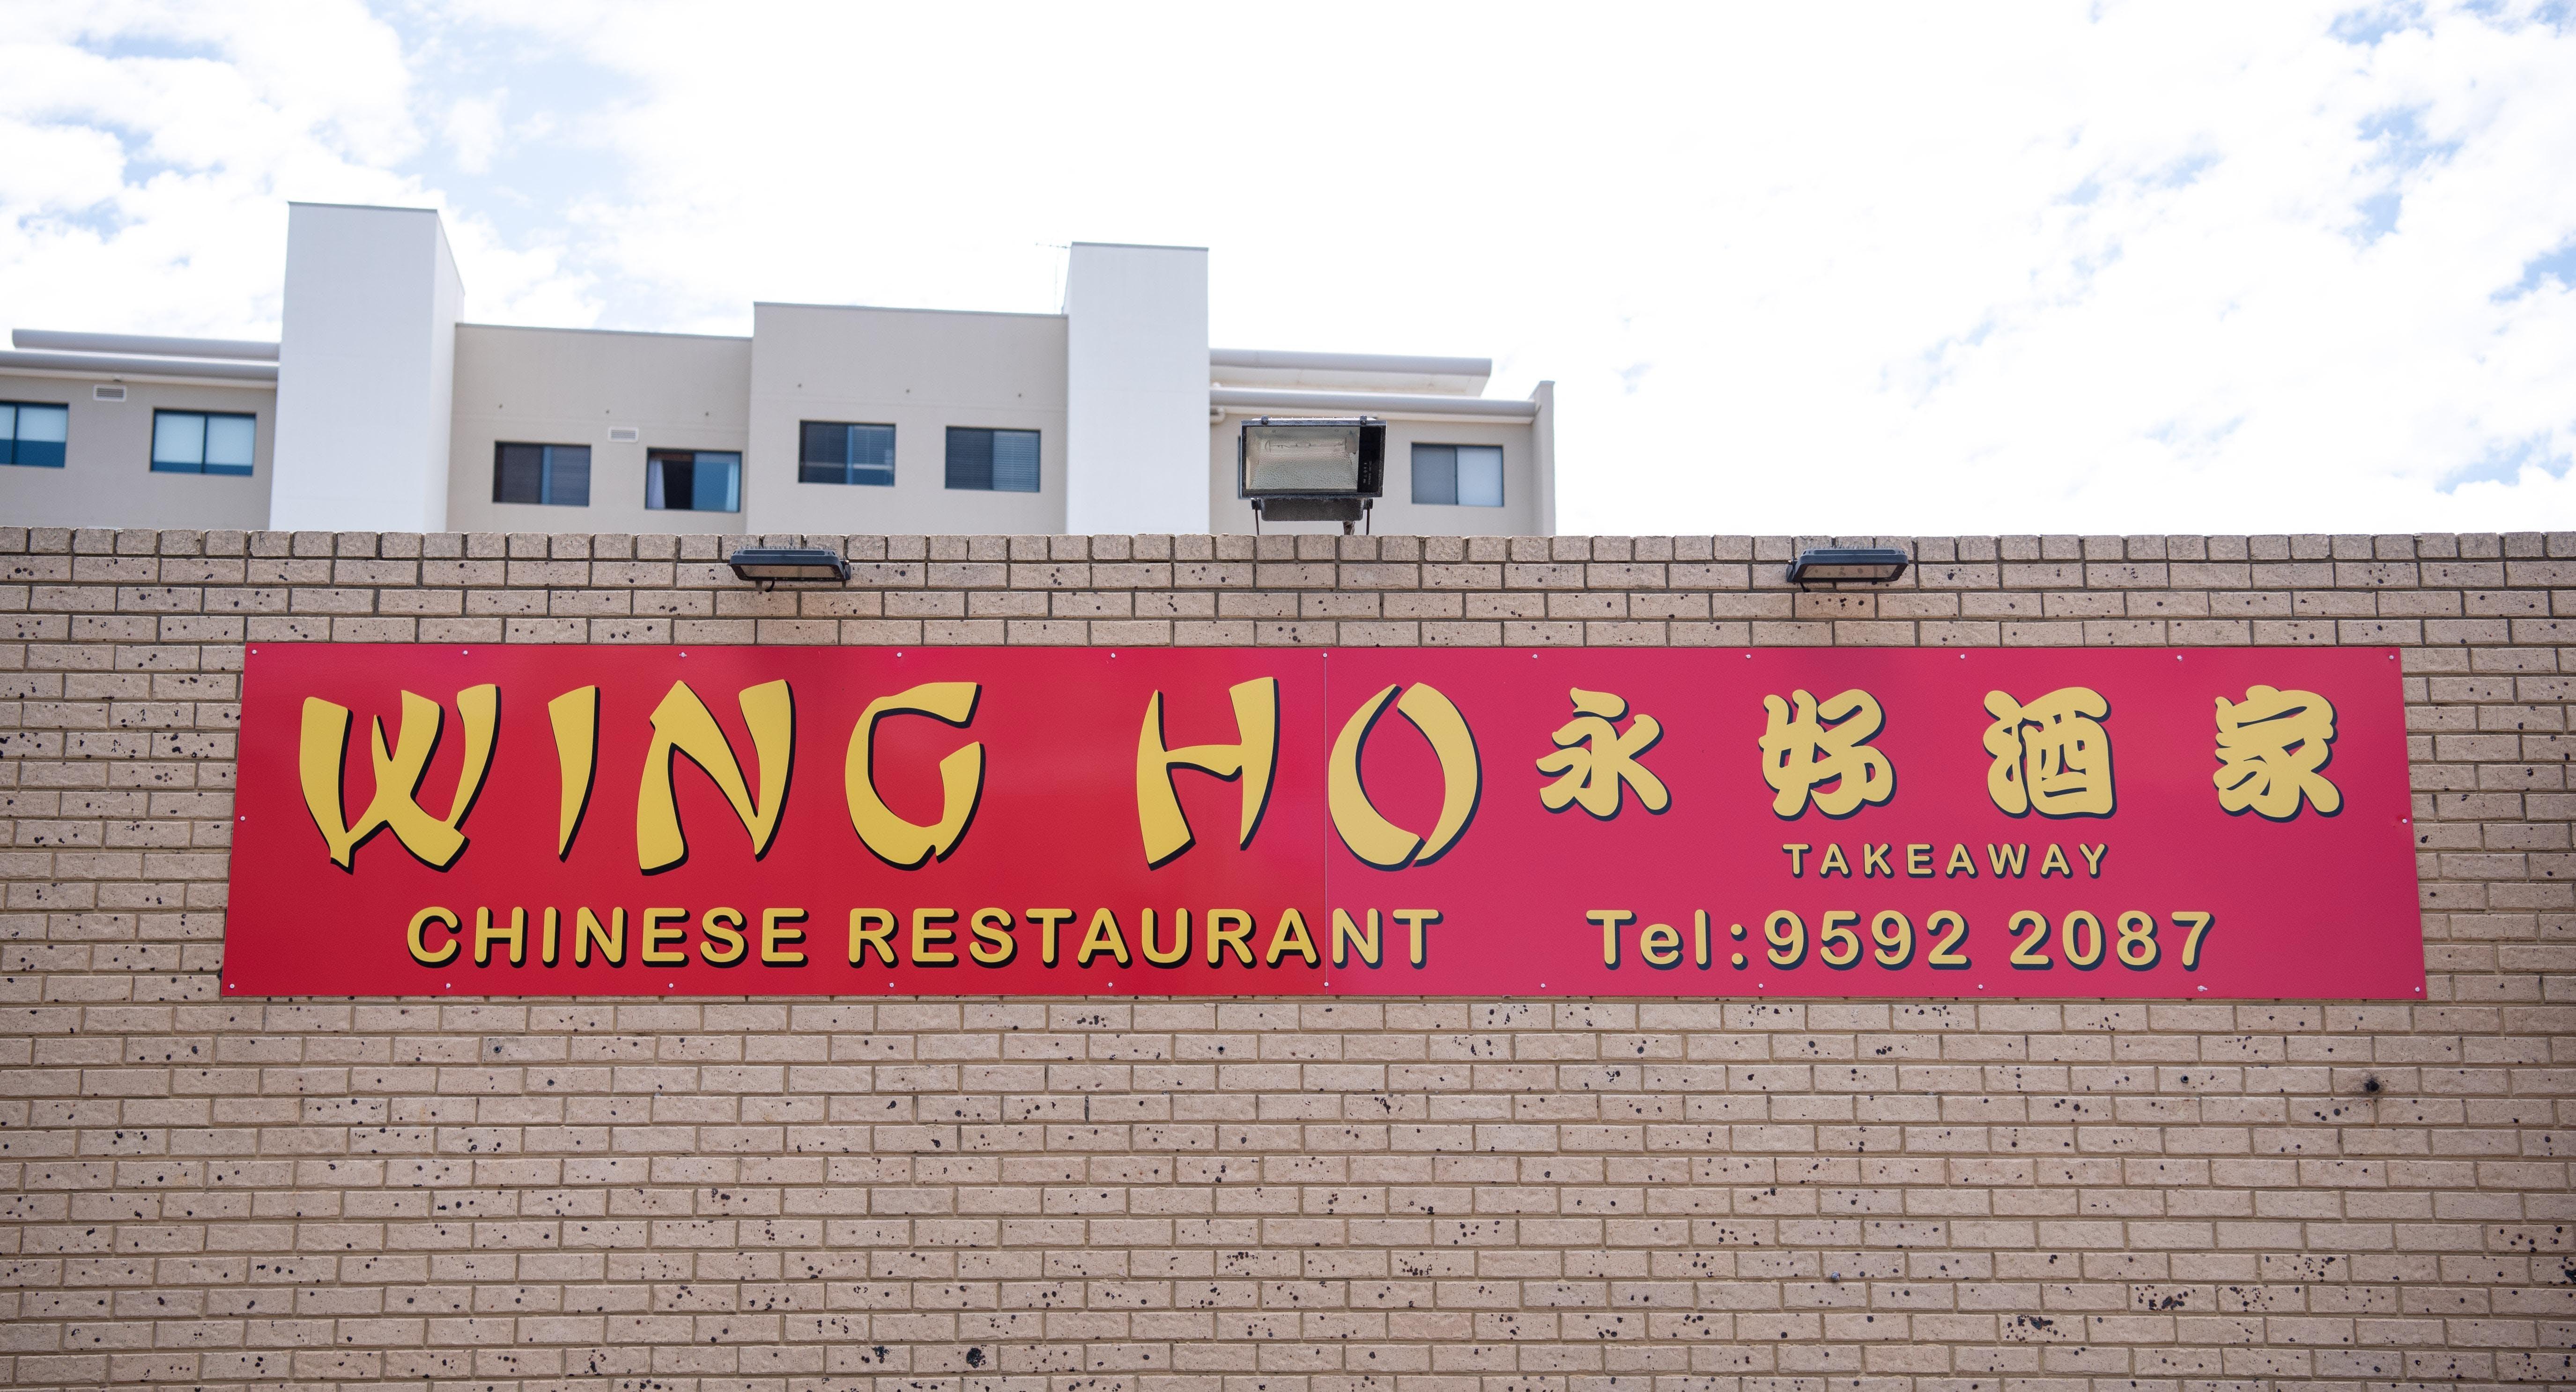 Photo of restaurant Wing Ho Chinese Restaurant in Shoalwater, Rockingham